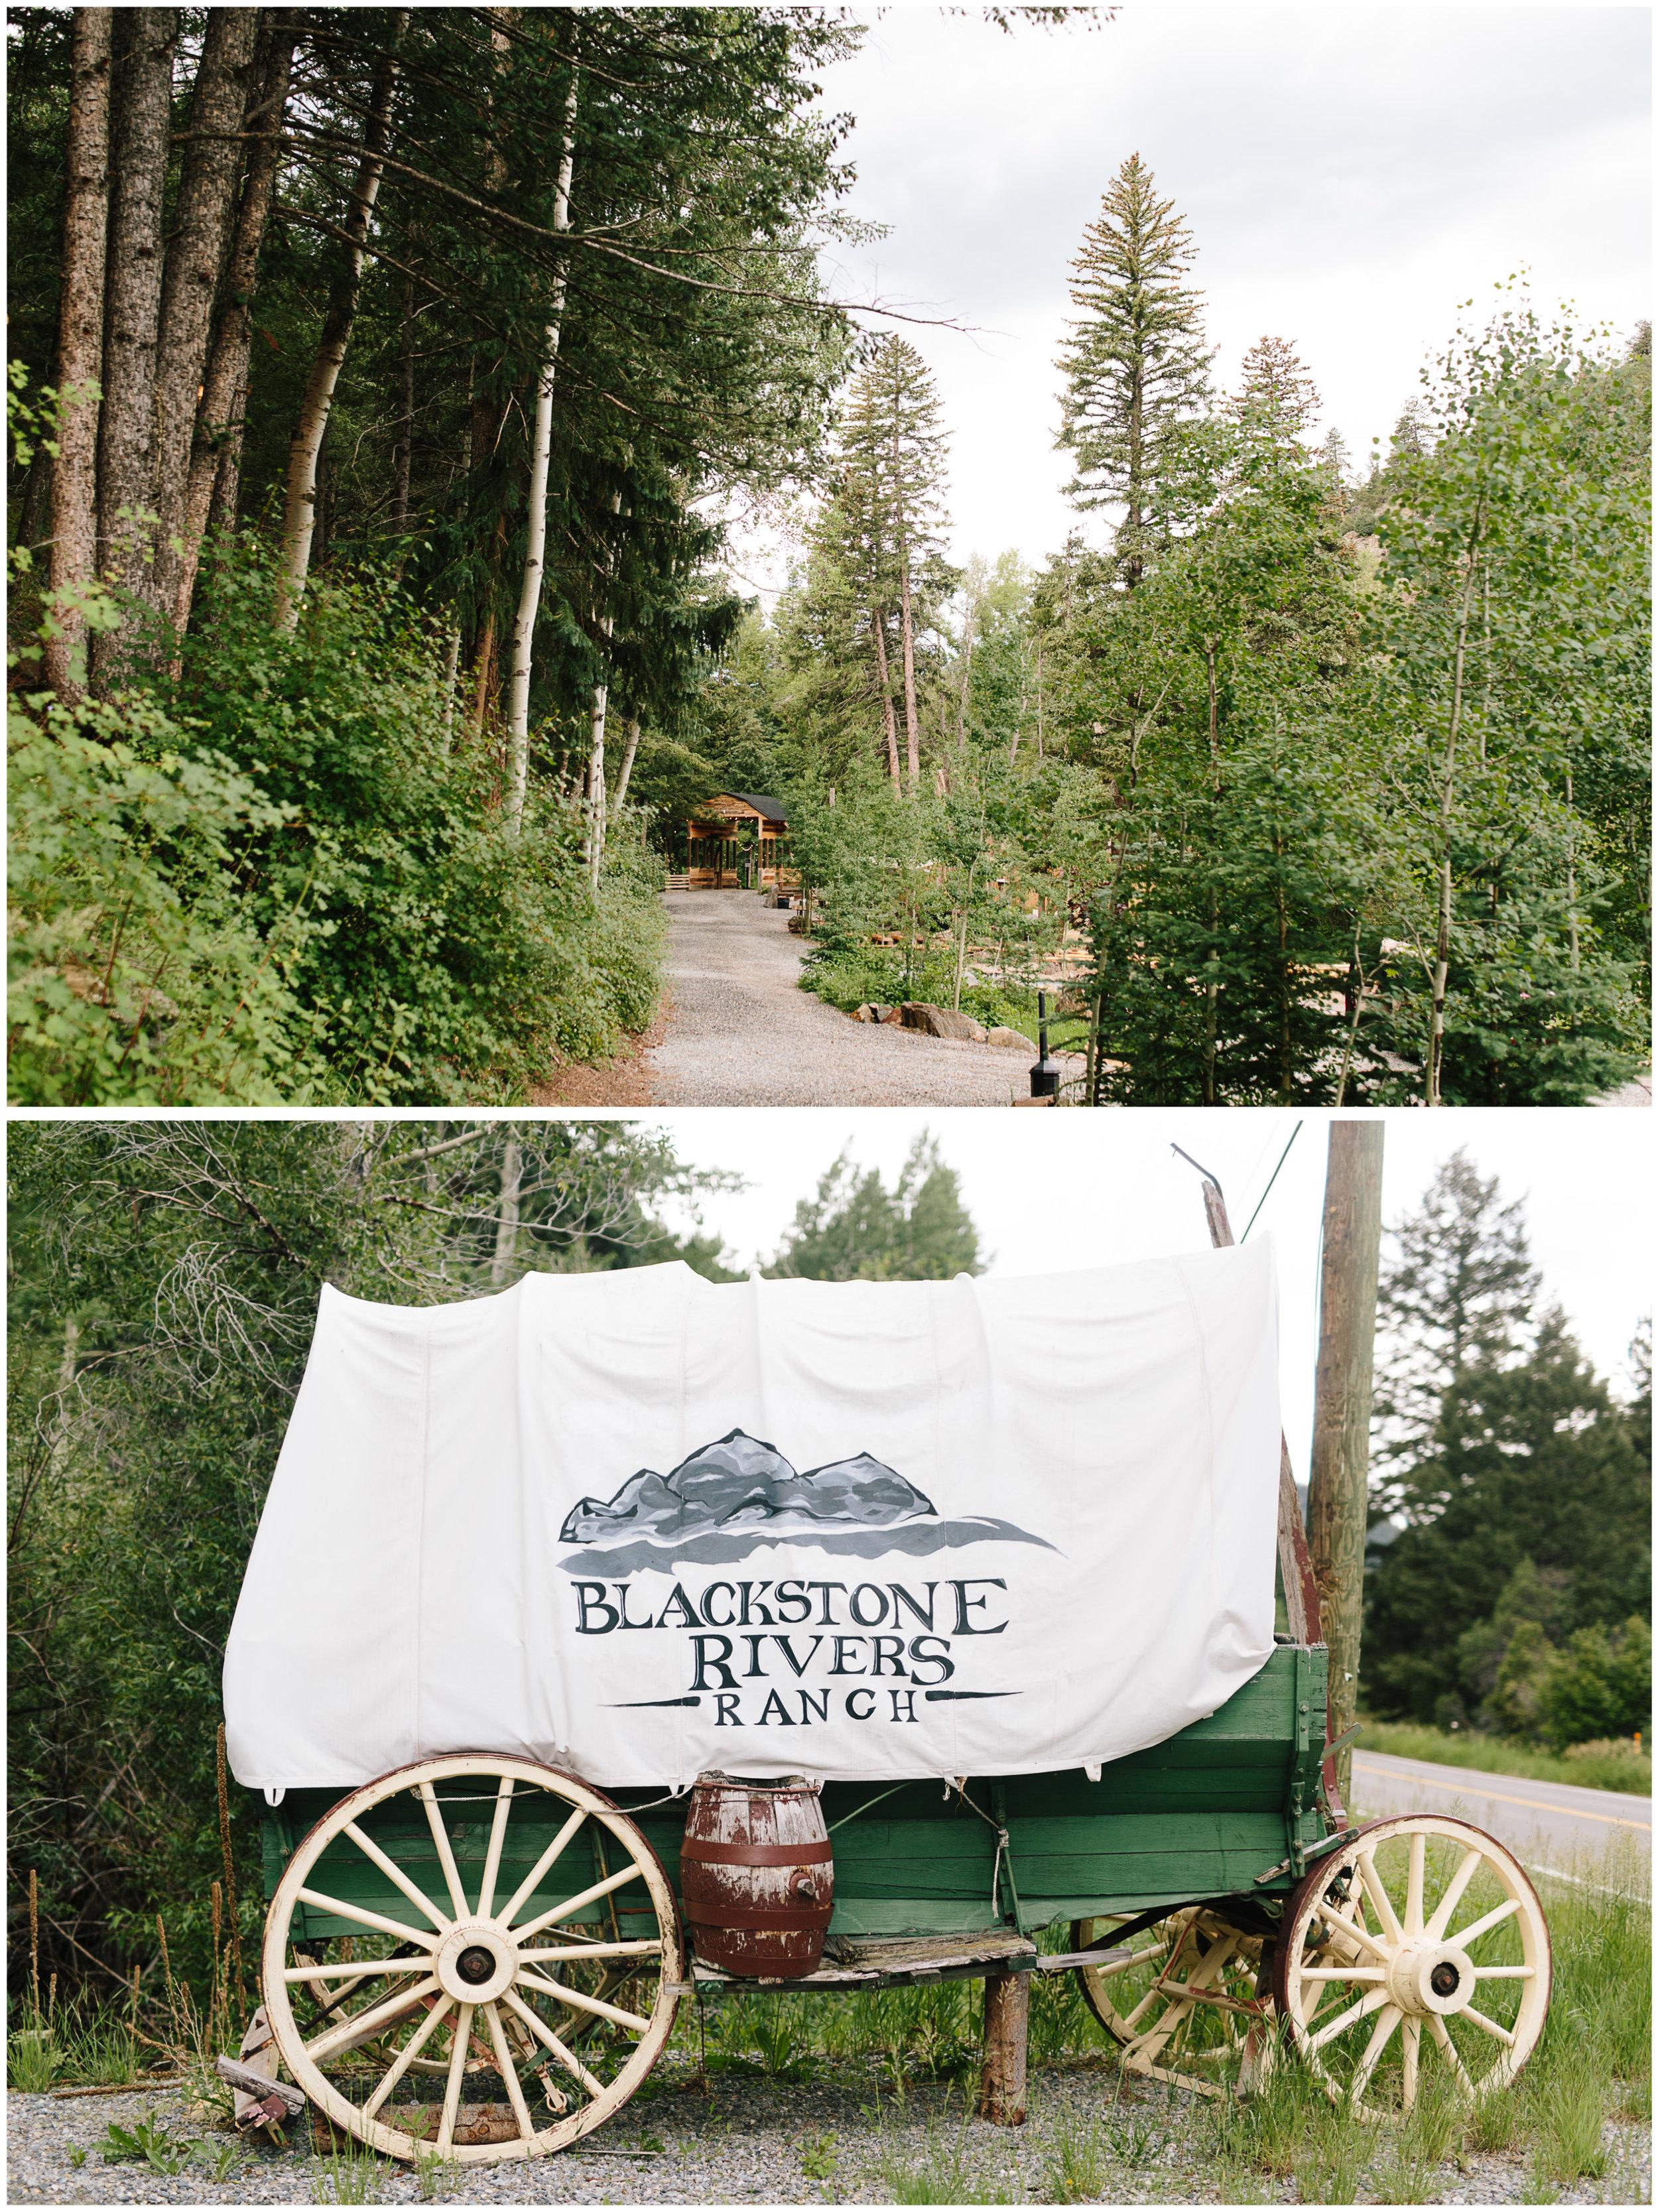 blackstone_rivers_ranch_wedding_1.jpg